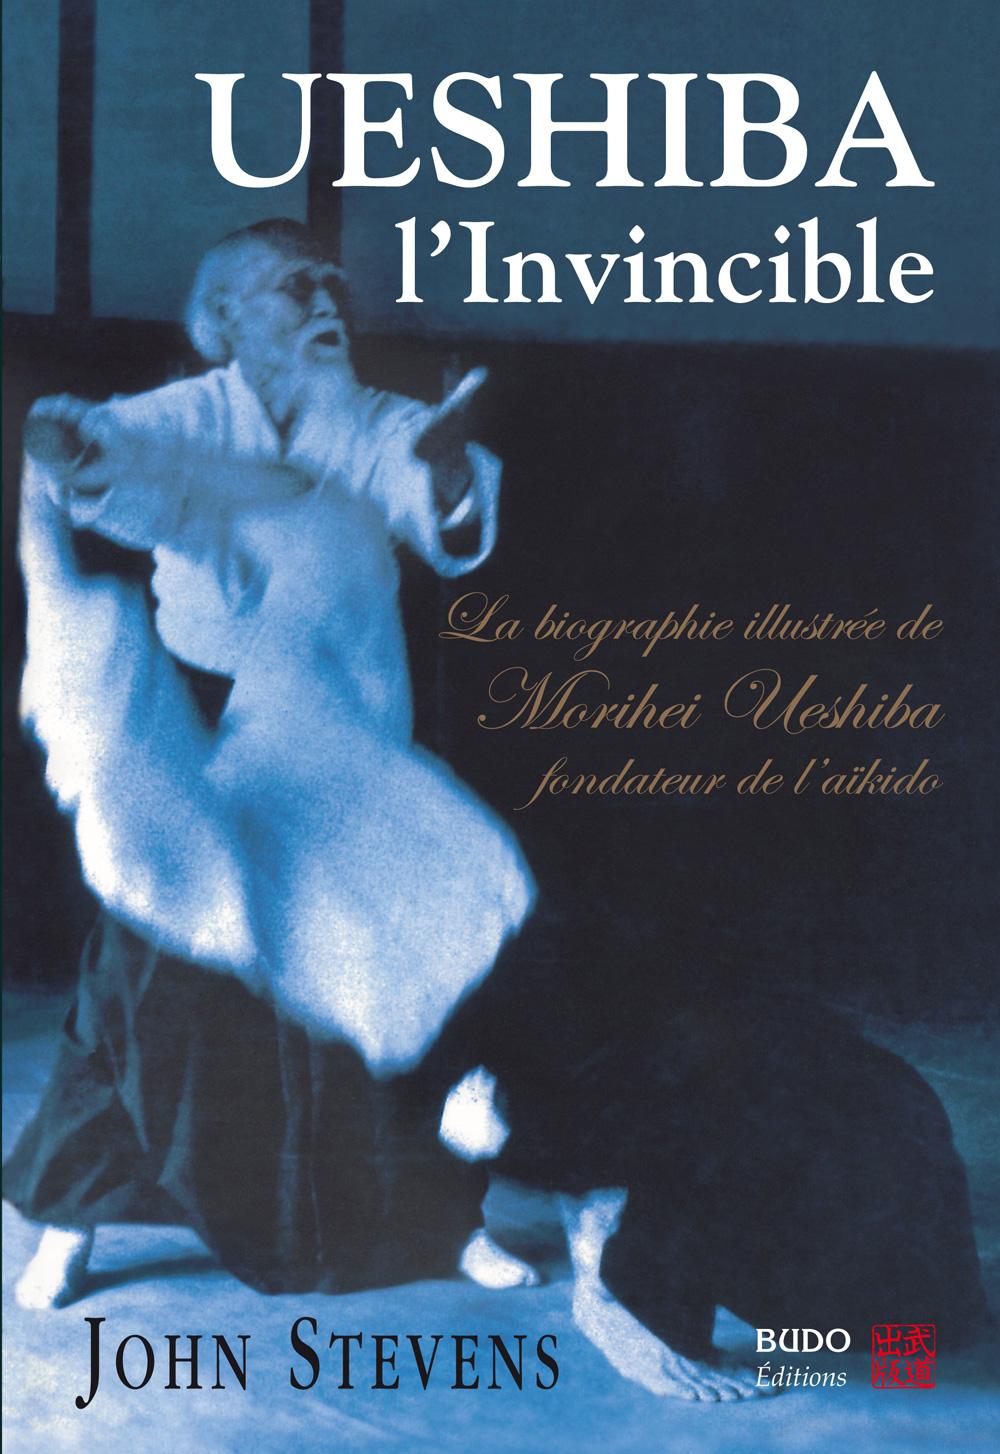 UESHIBA L'INVINCIBLE La biographie illustrée de Morihei Ueshiba